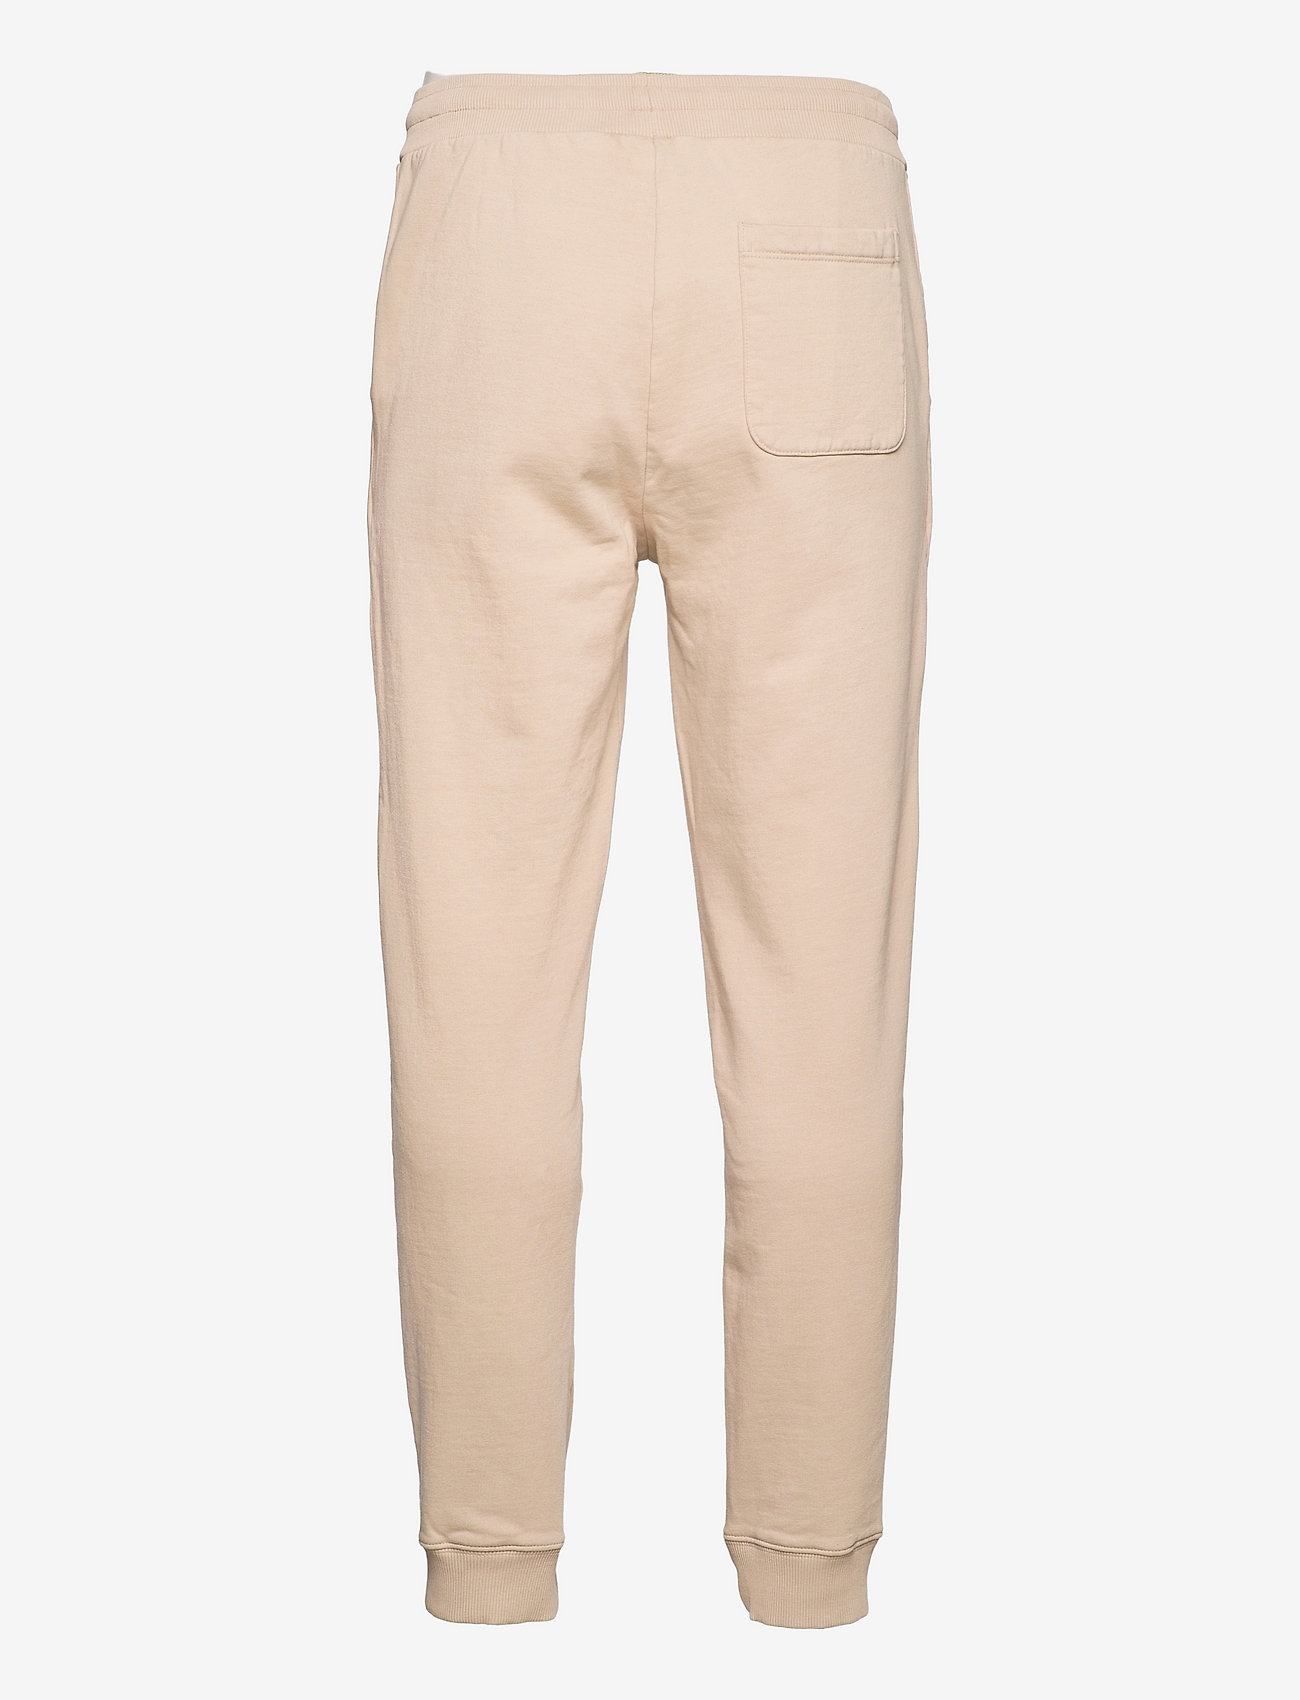 Samsøe Samsøe - Norsbro trousers 11720 - kleding - humus - 1